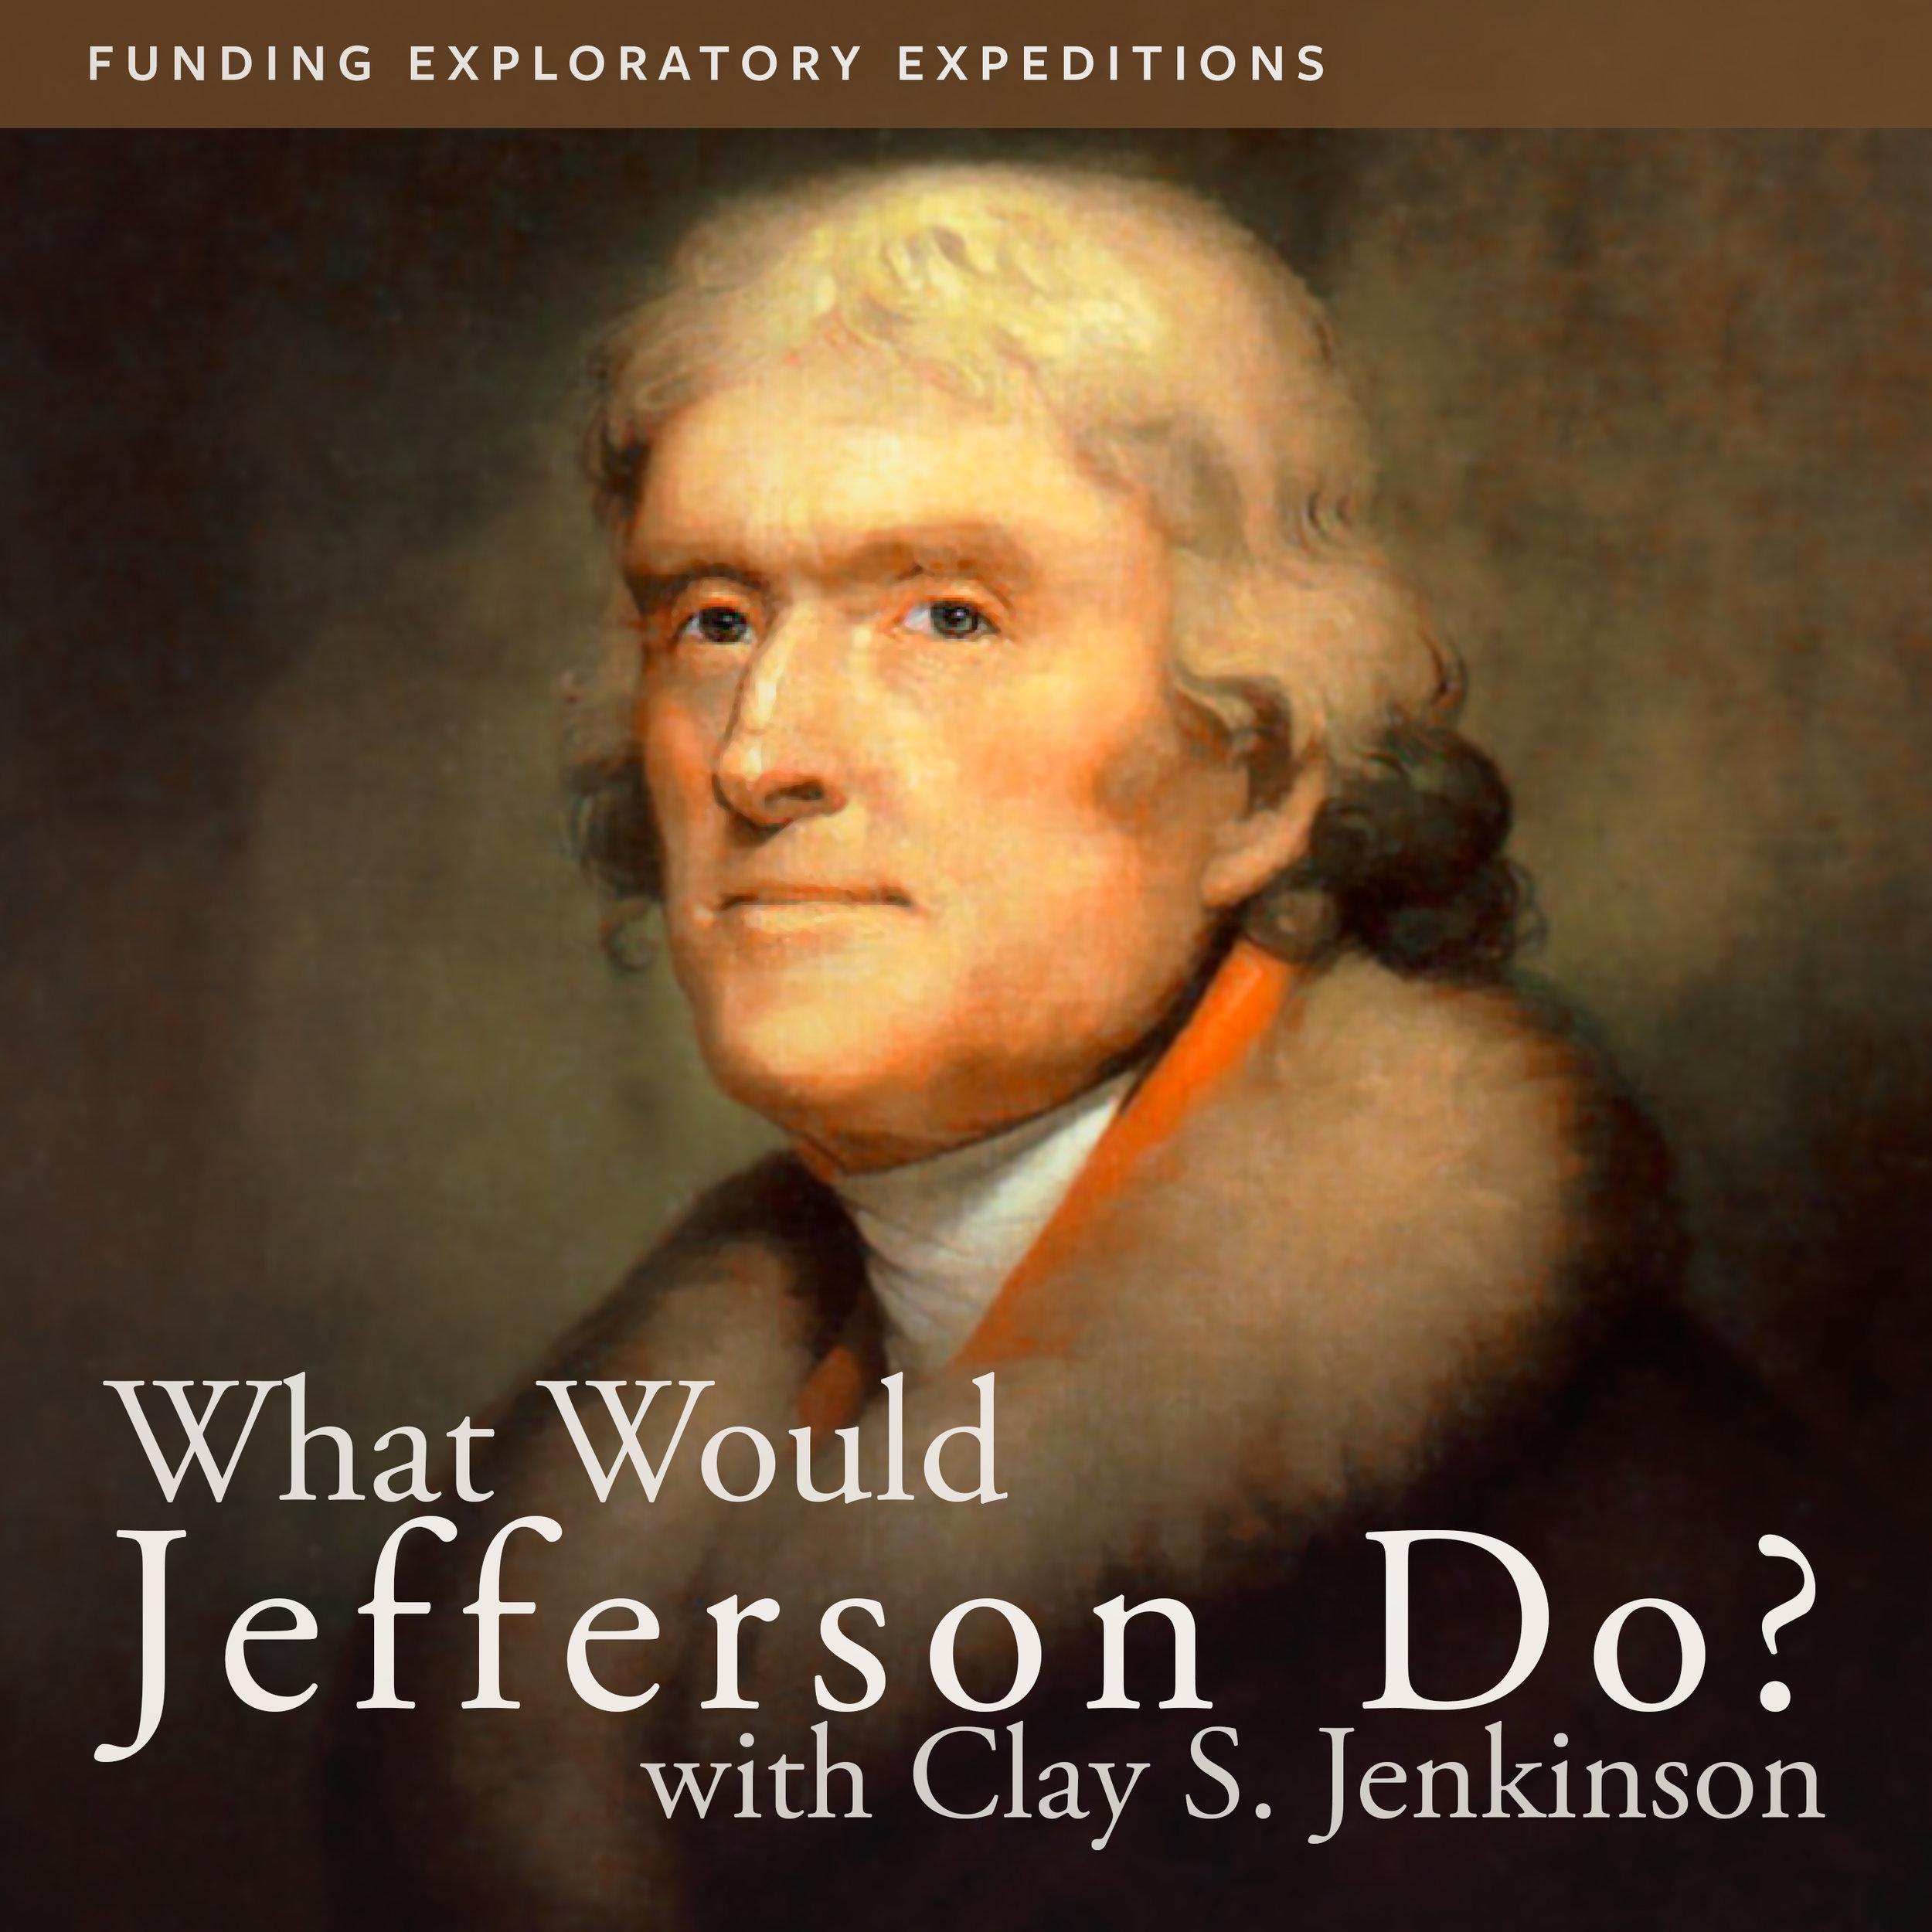 WWTJD_1268 Funding Exploratory Expeditions.jpg